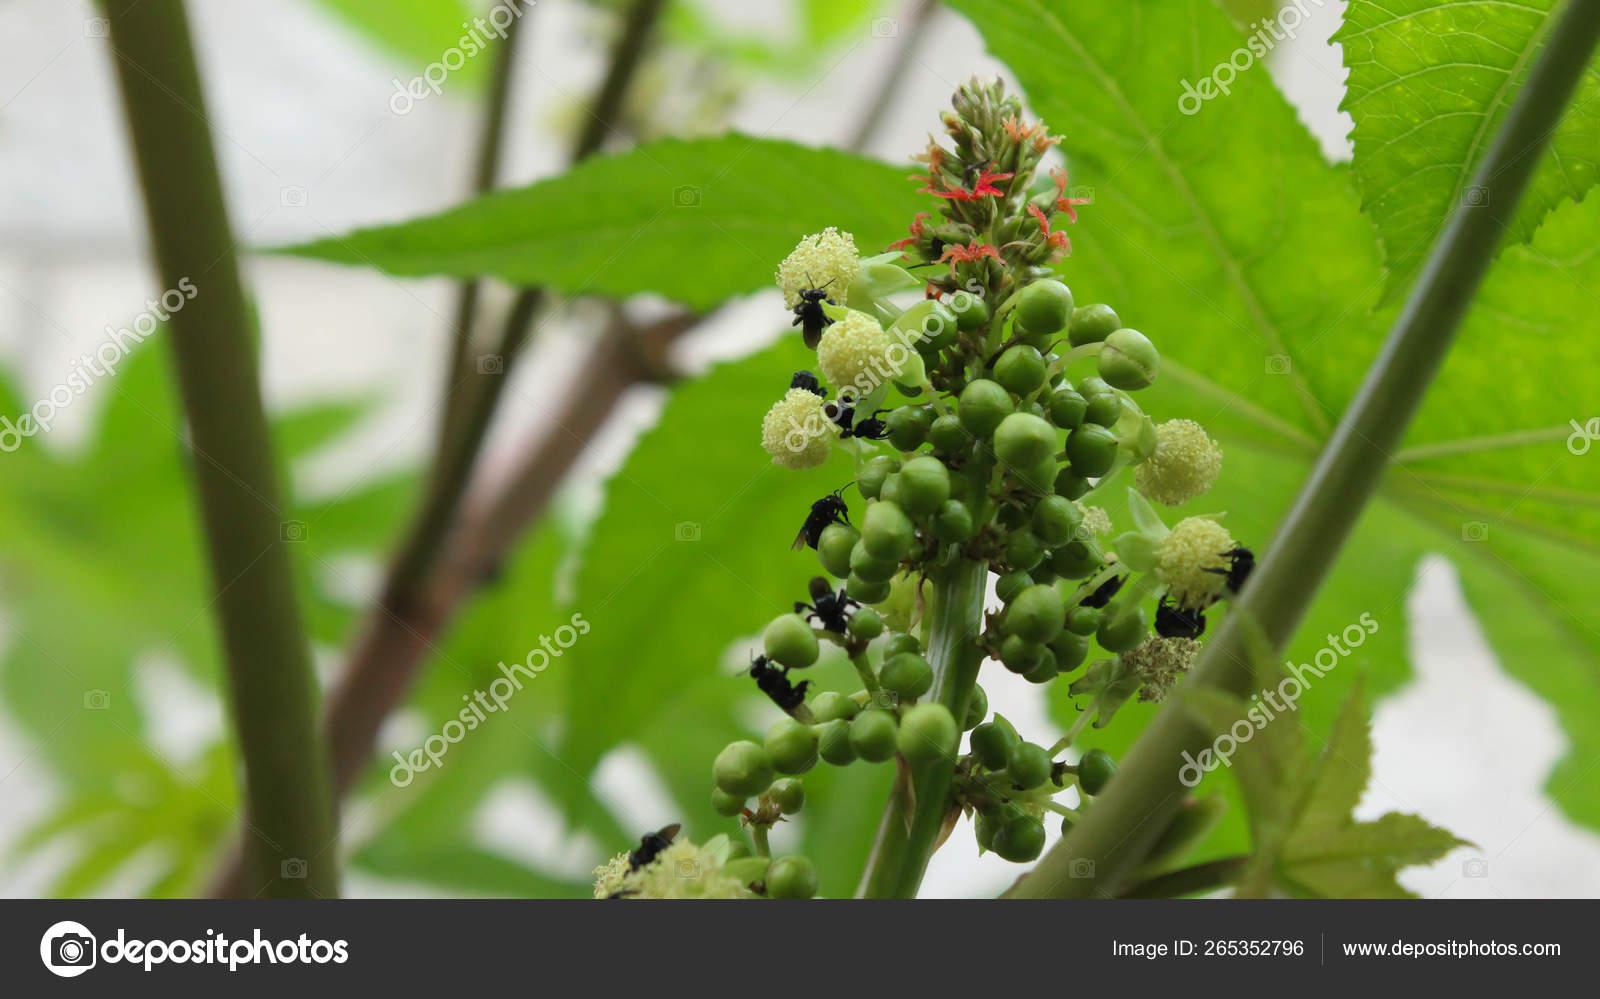 Castor Bean Castor Oil Plant Ricinus Communis Inflorescence Male Female Stock Photo C Reyesphoto 265352796